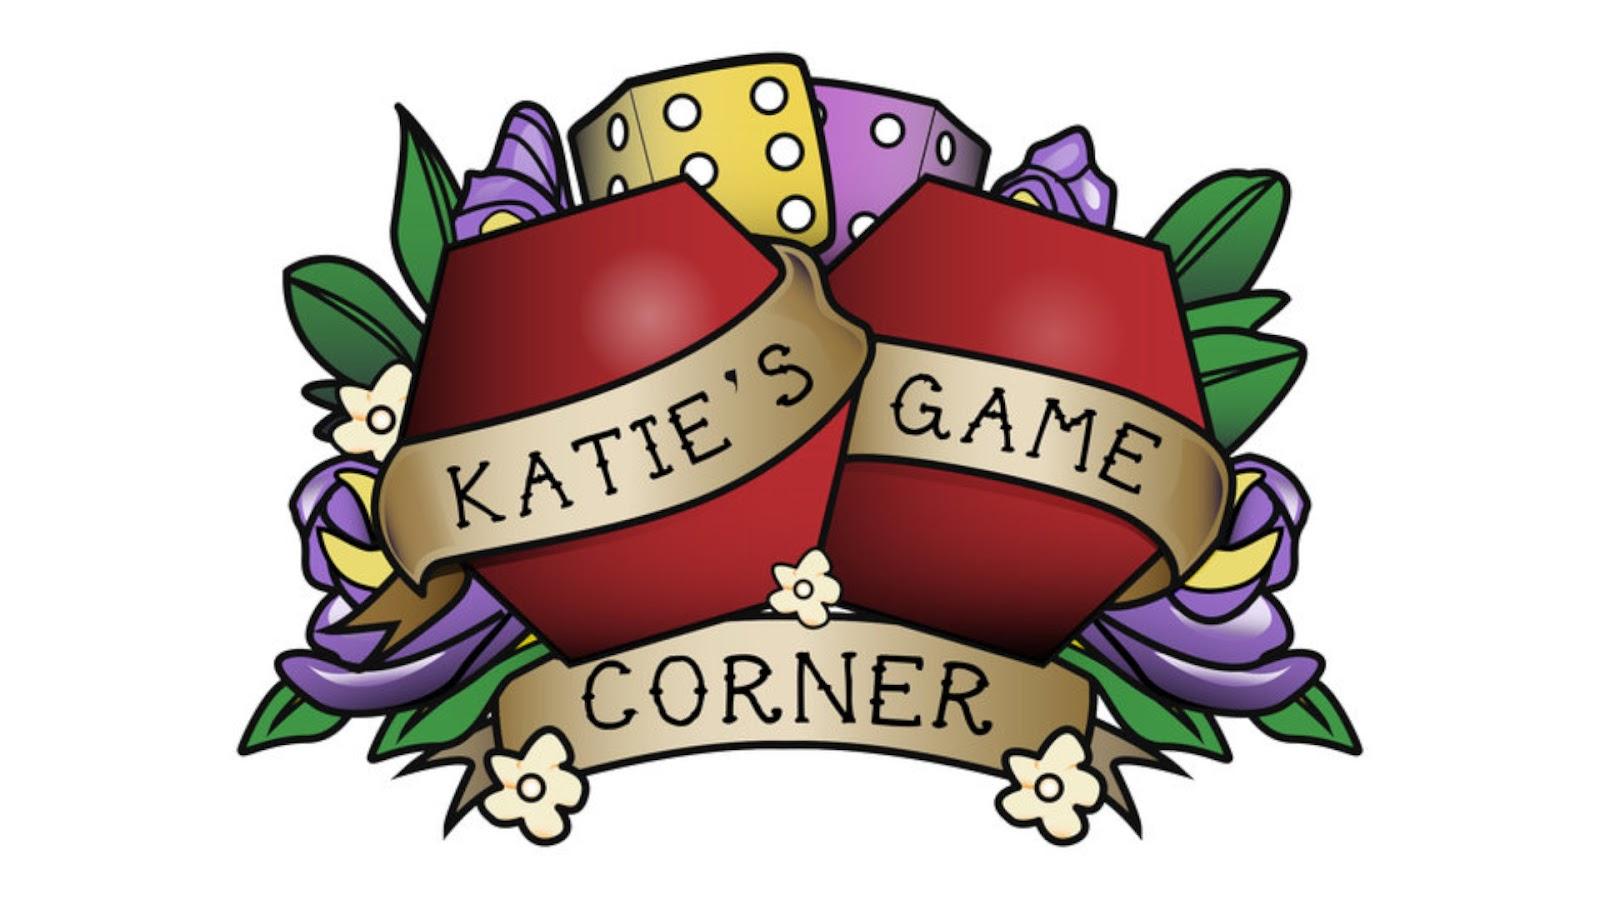 News Collider - Katies Game Corner Plagiarism